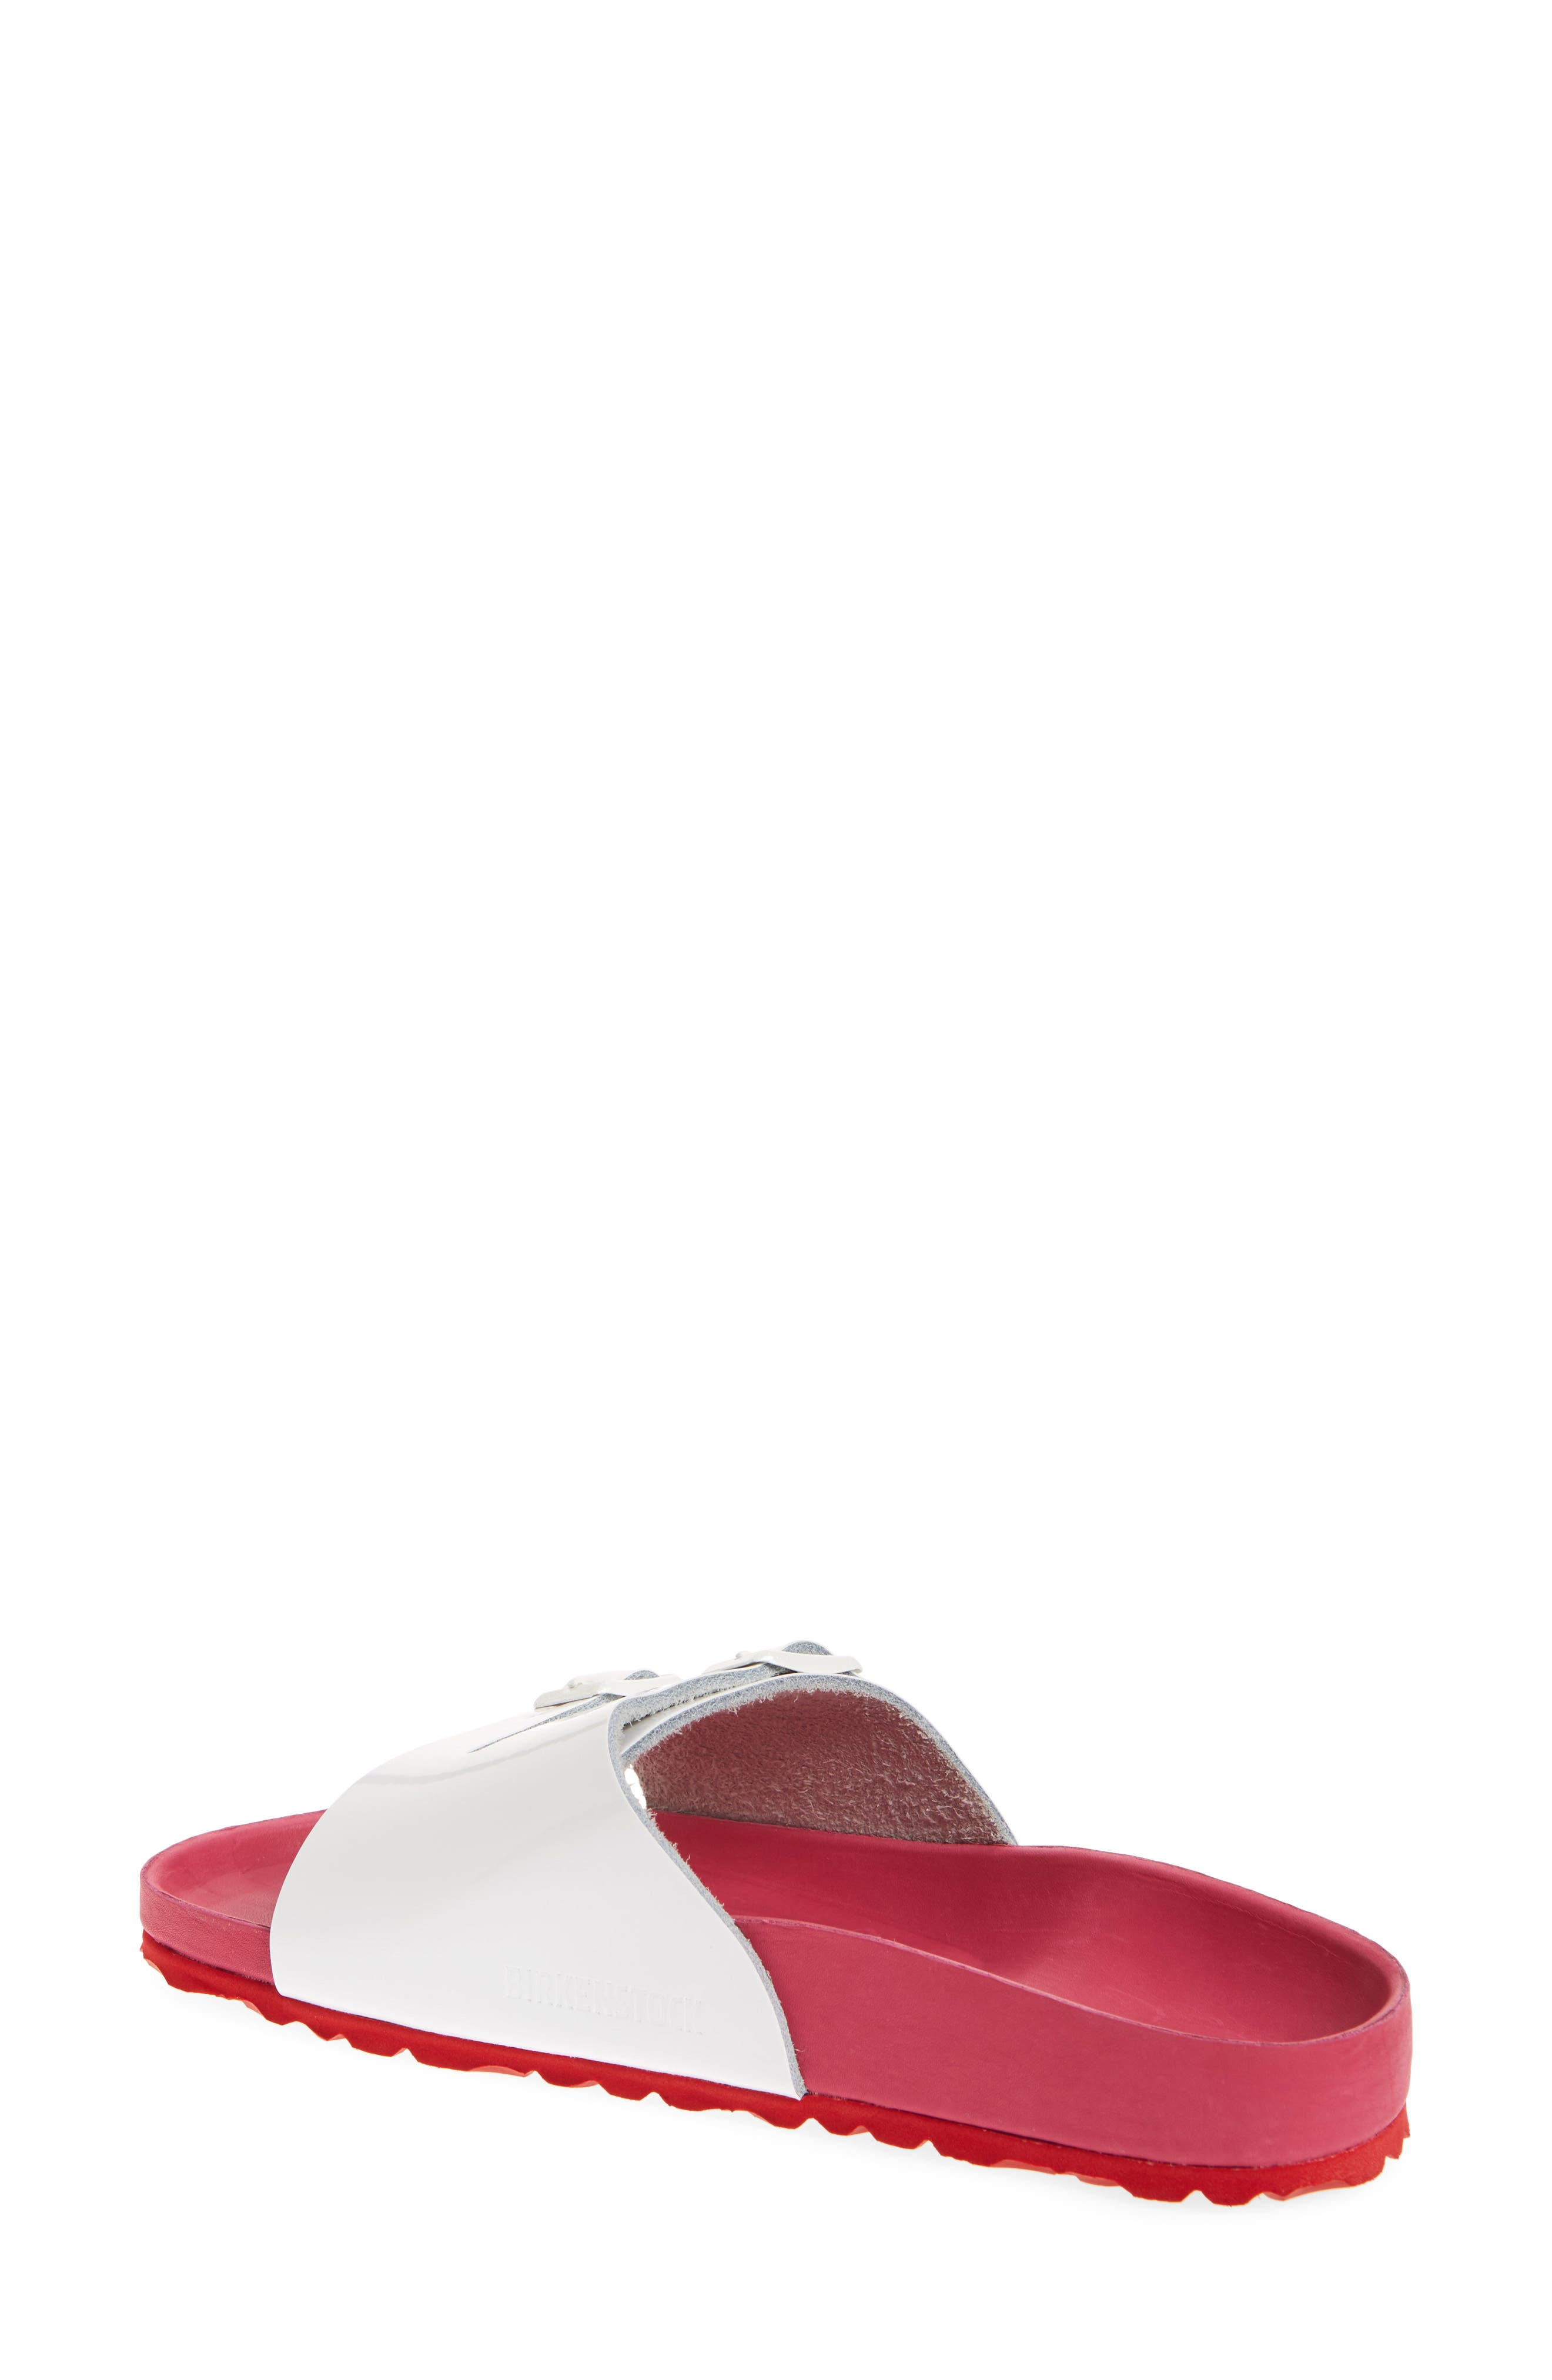 Birkenstock Women's Vaduz Exquisite Limited Edition - Shock Drop Sandal DdixFOz